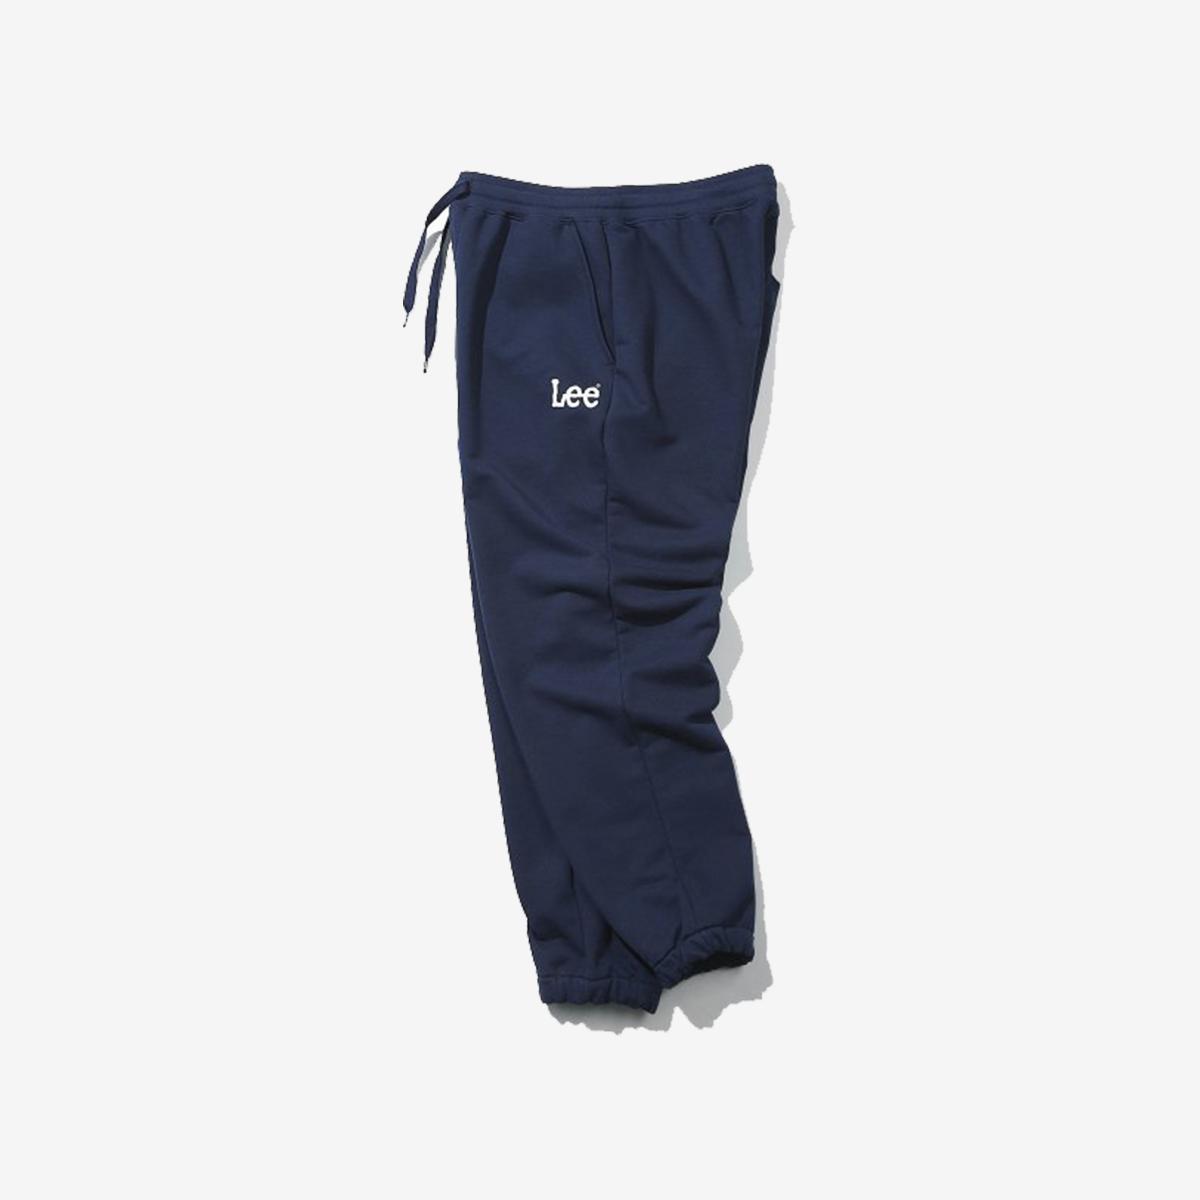 LOGO標誌運動褲(海軍藍)